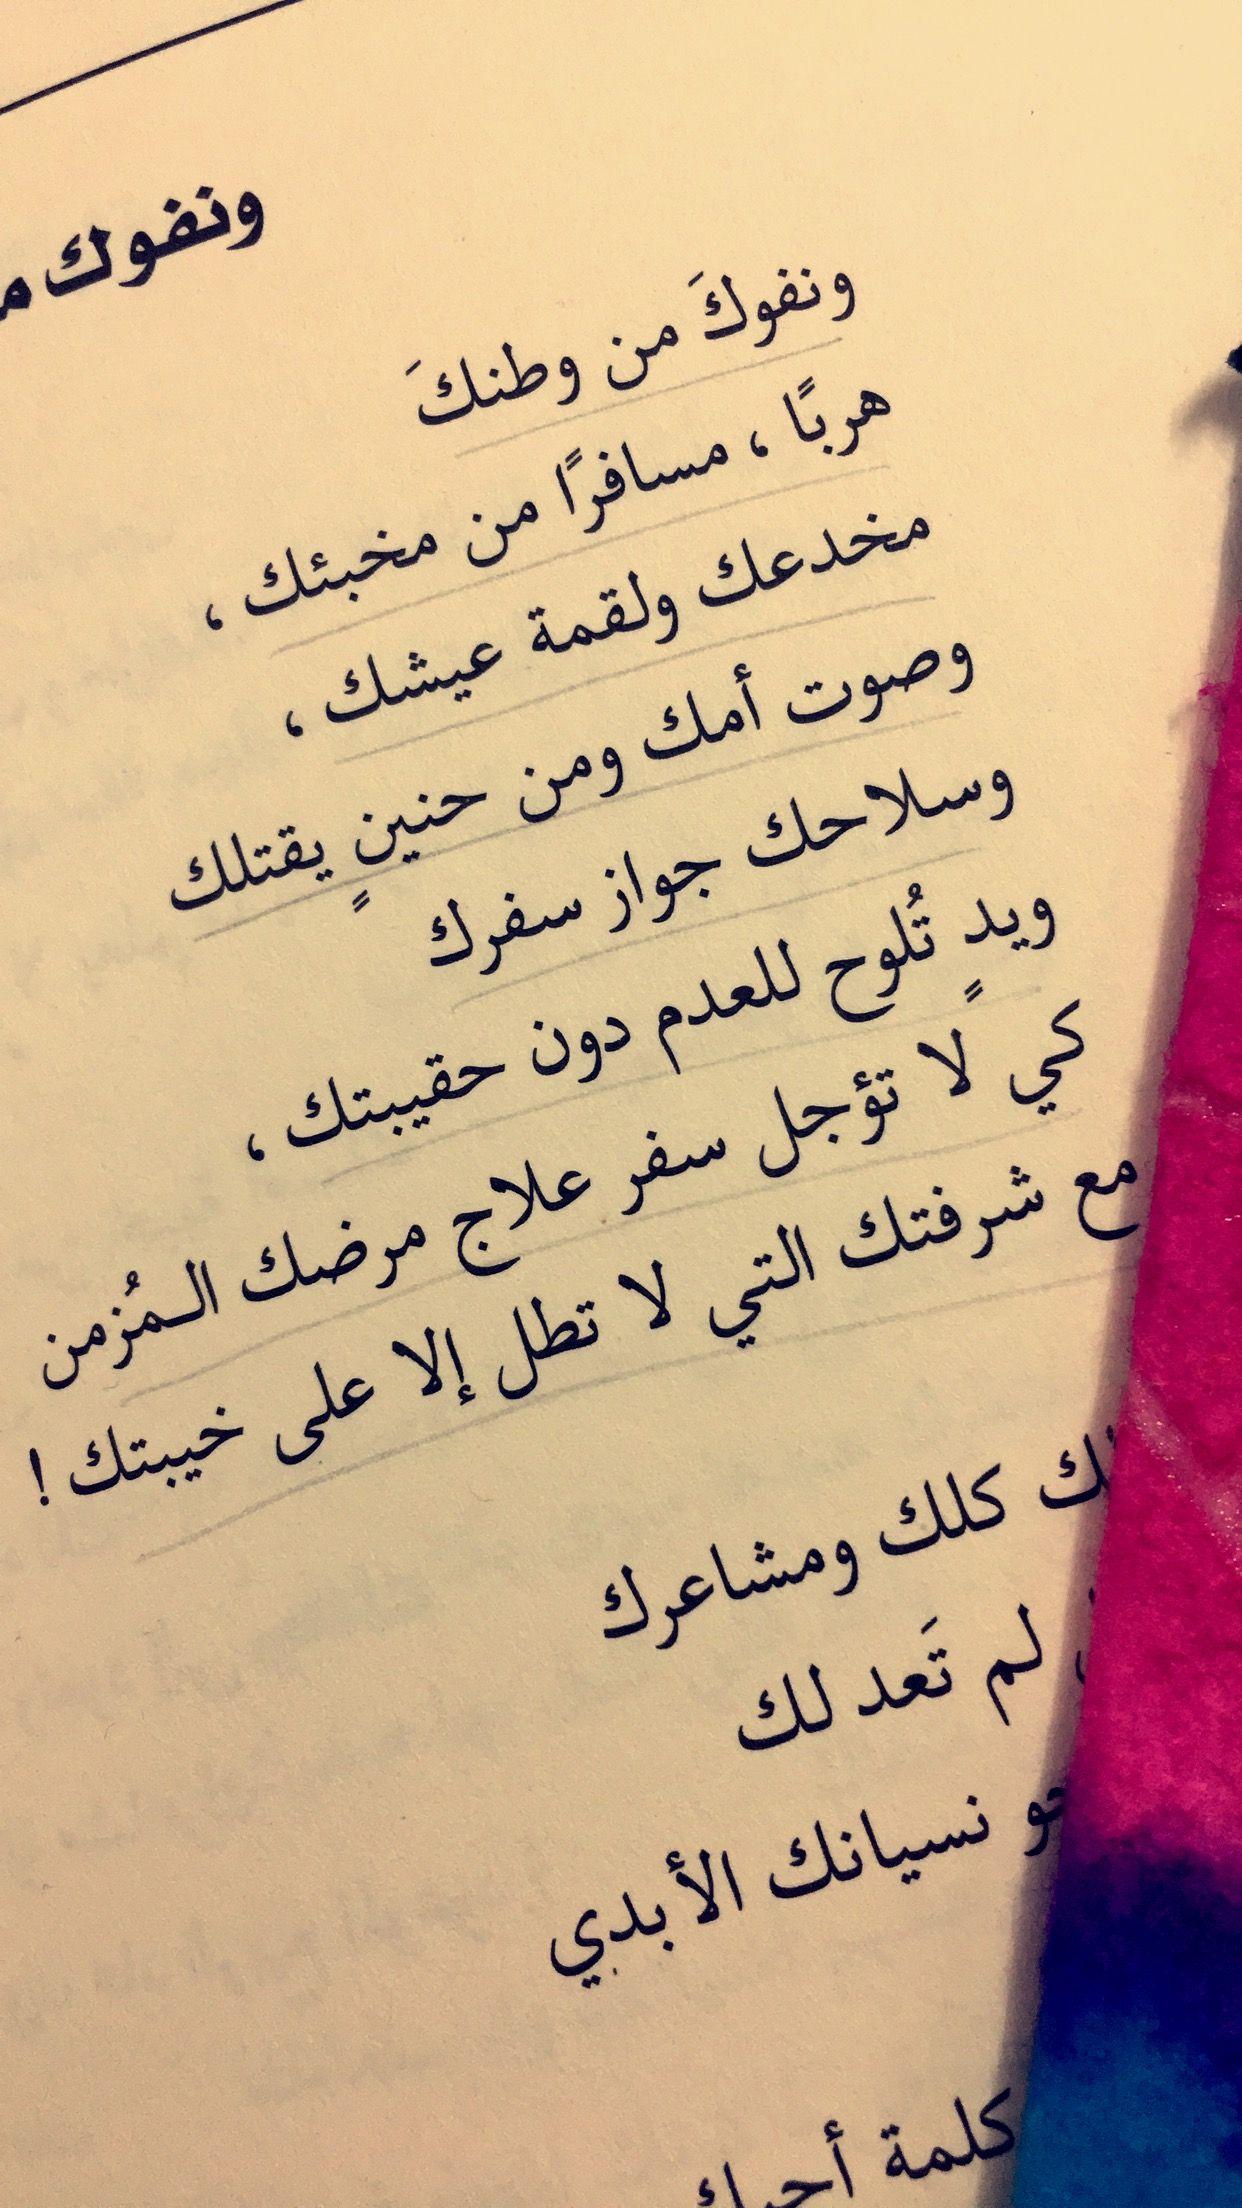 اقتباسات قل وداعا Calligraphy Arabic Calligraphy